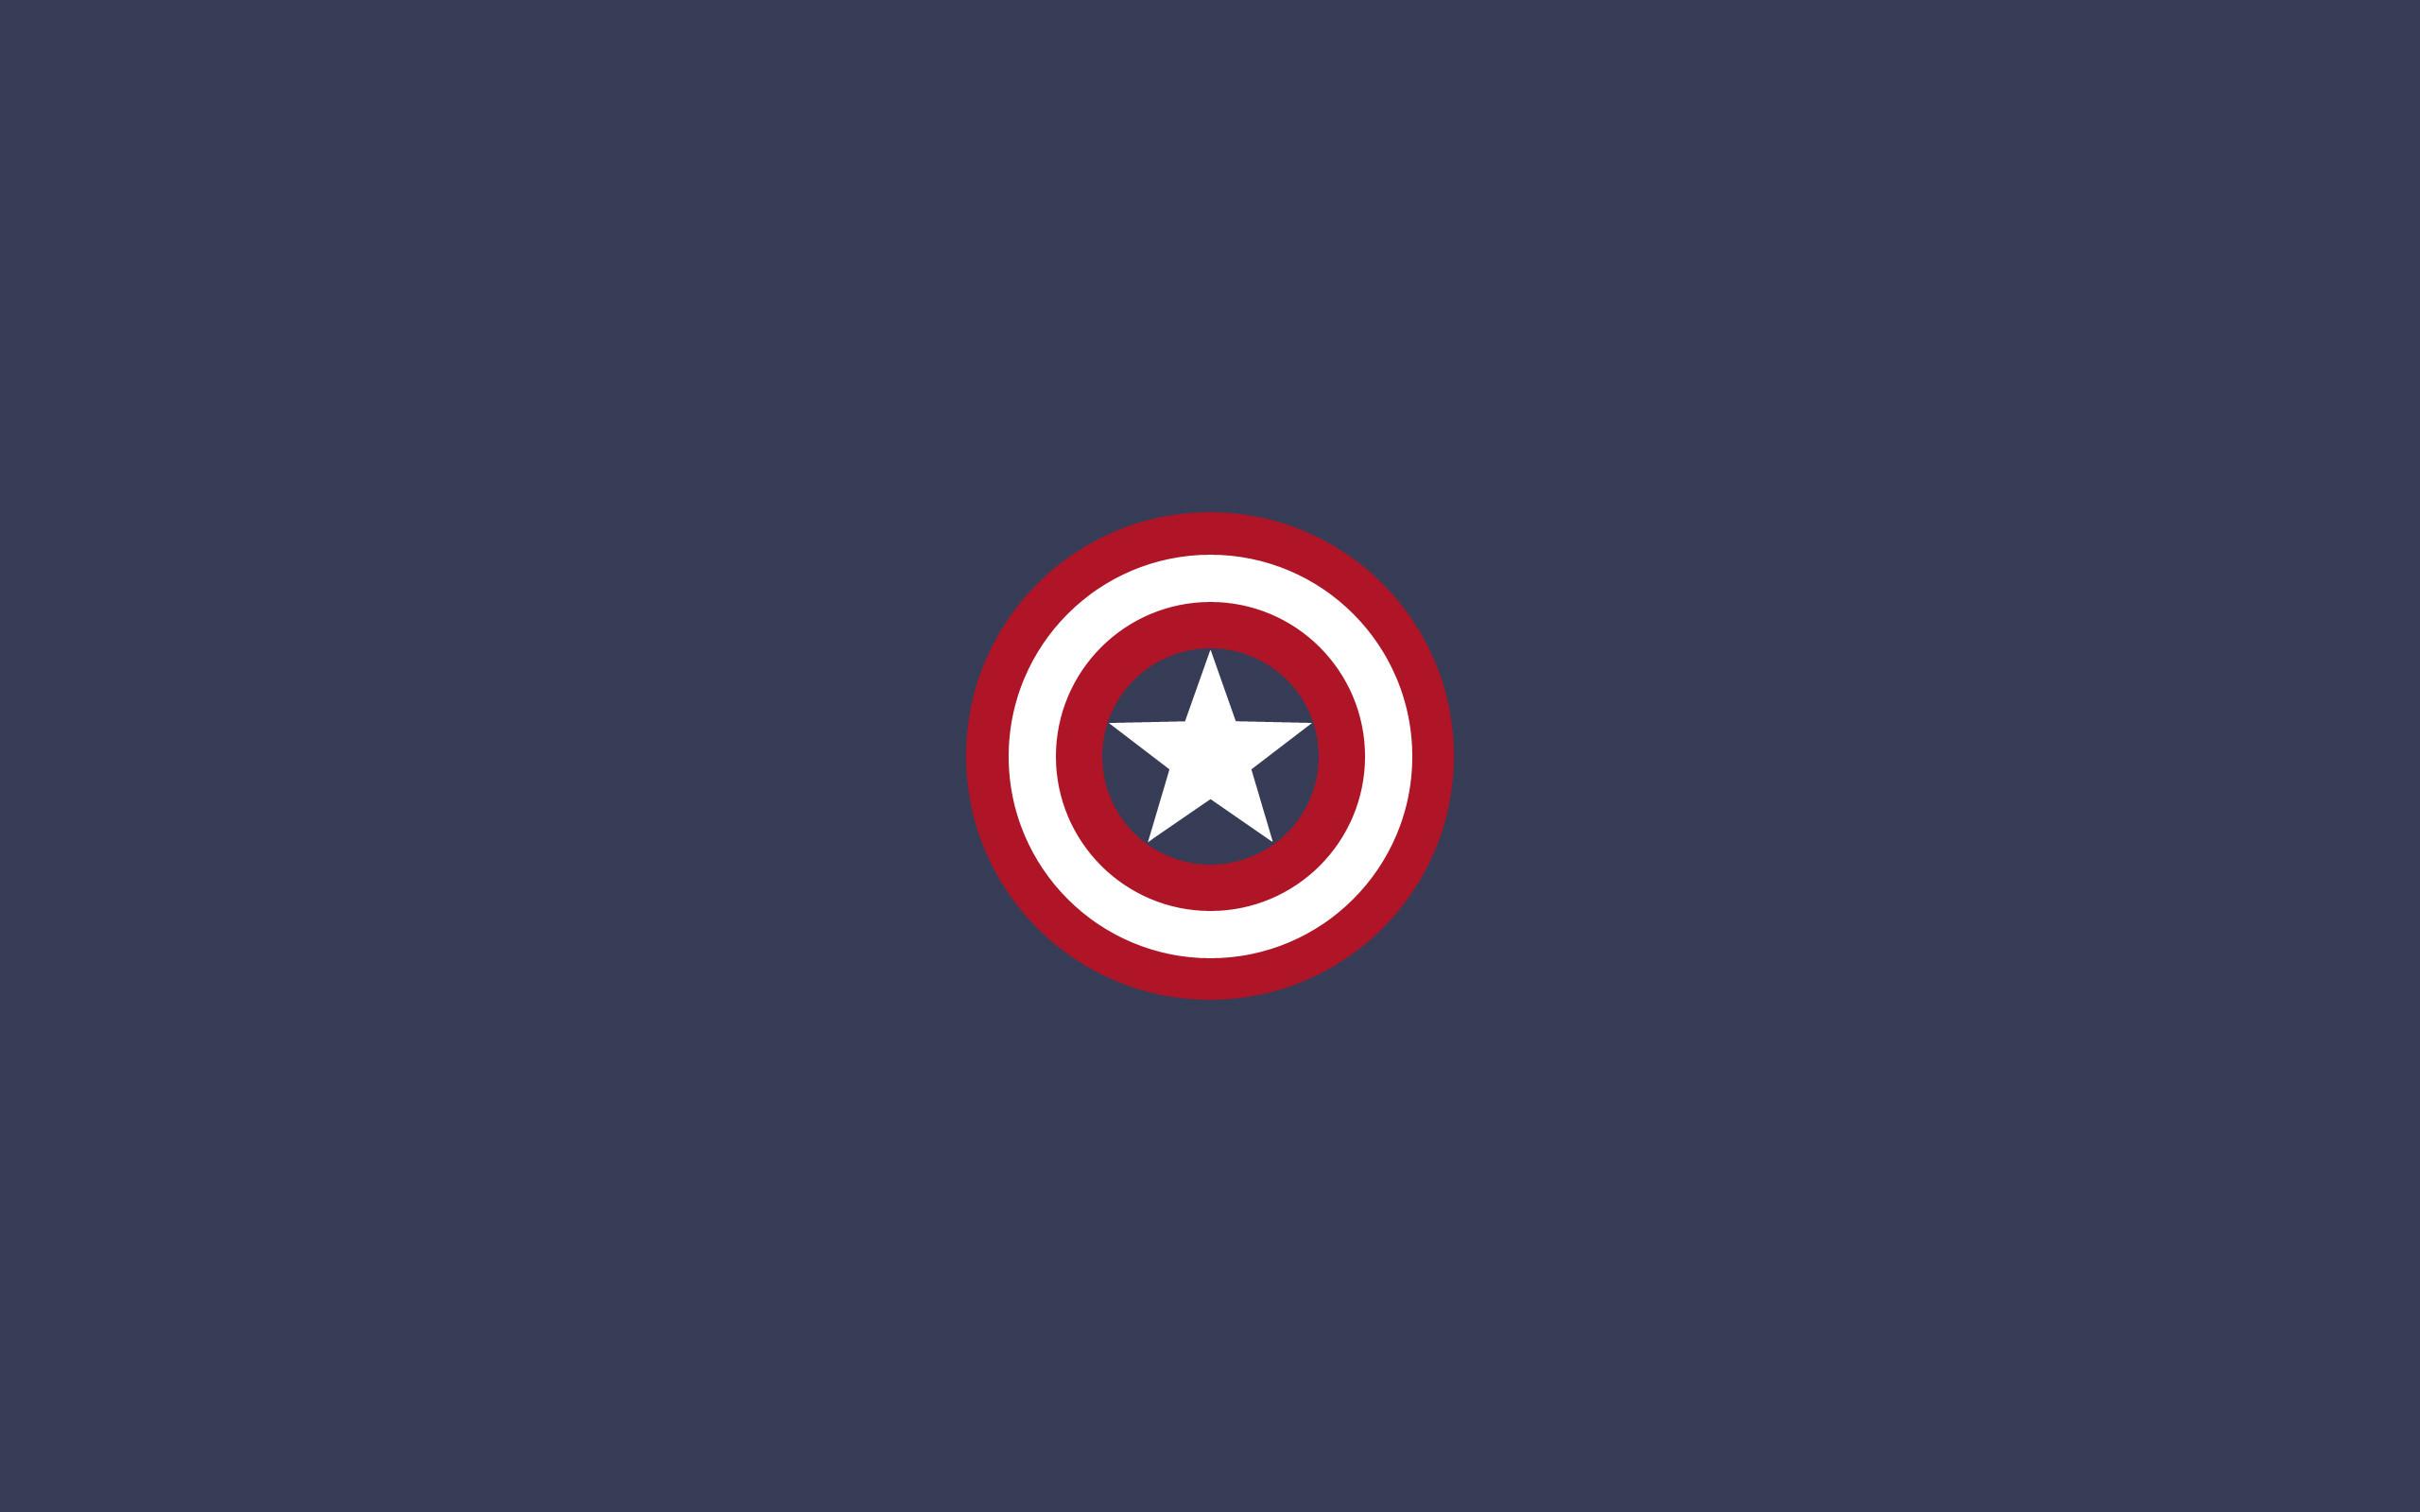 Captain America Minimalist Wallpaper 75 Images